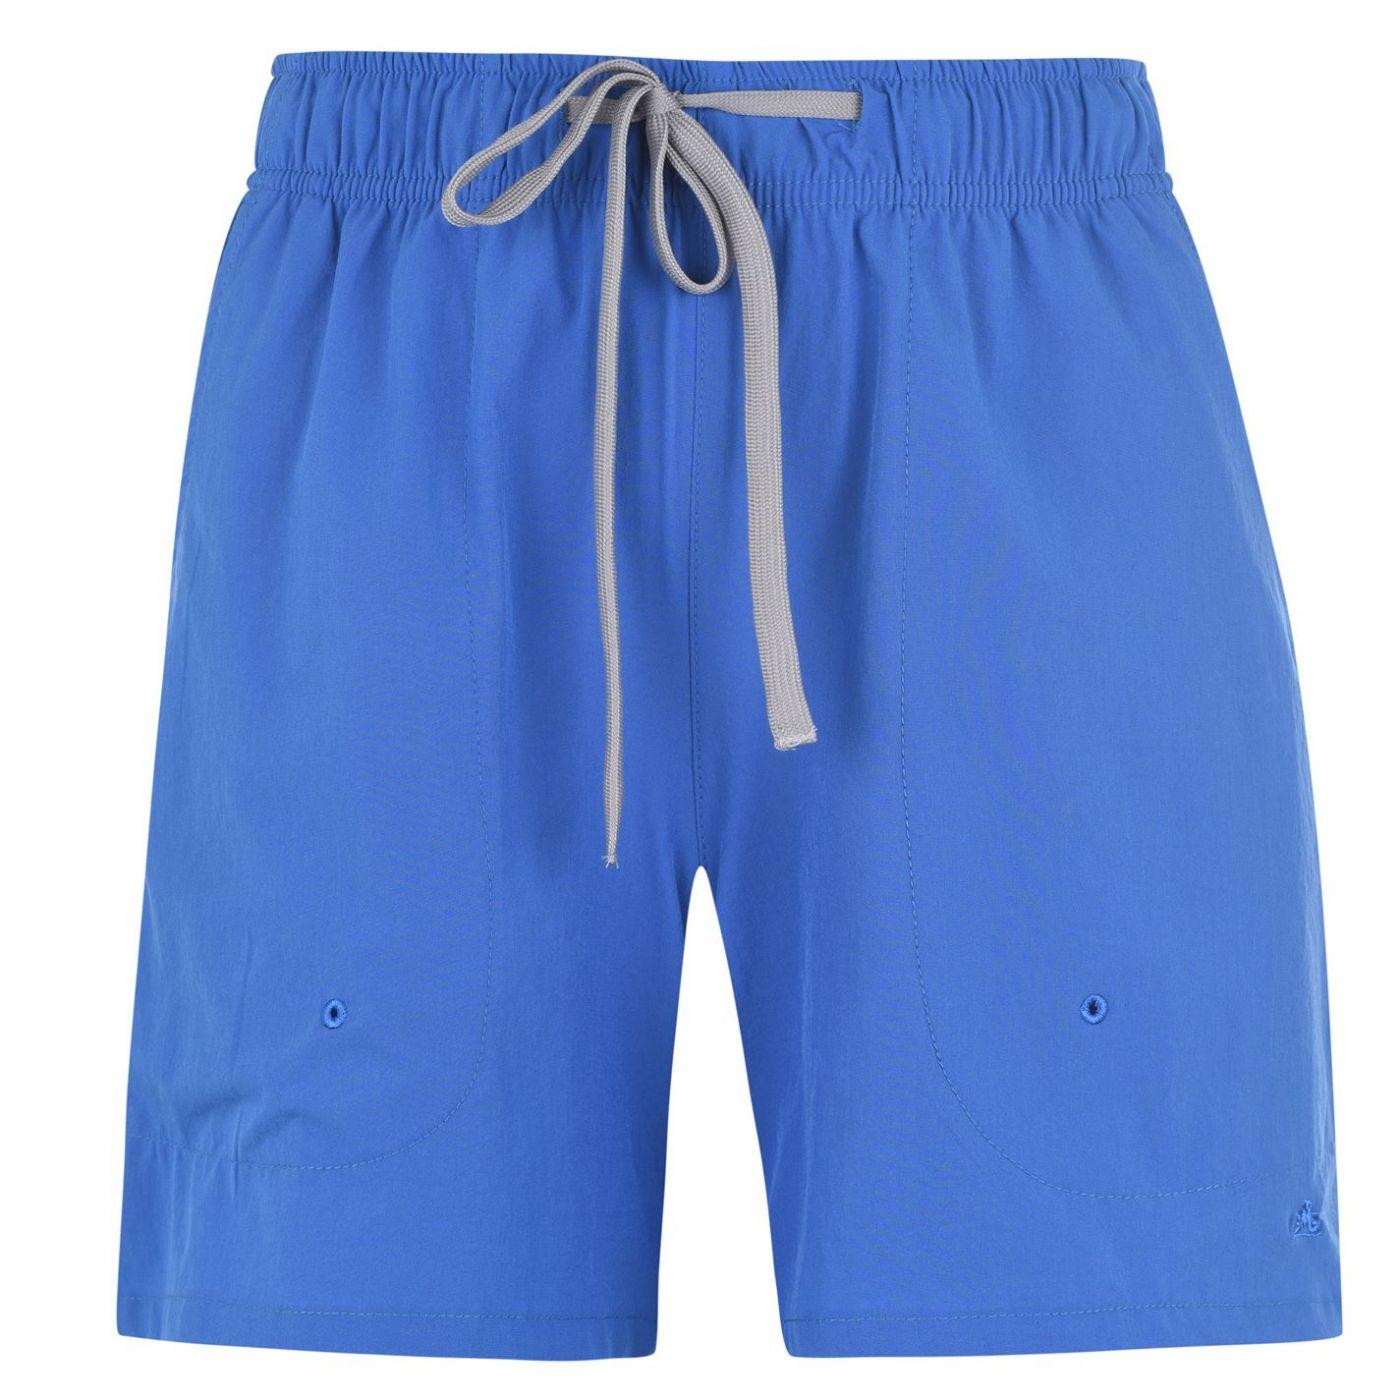 Eastern Mountain Sports River Shorts Ladies